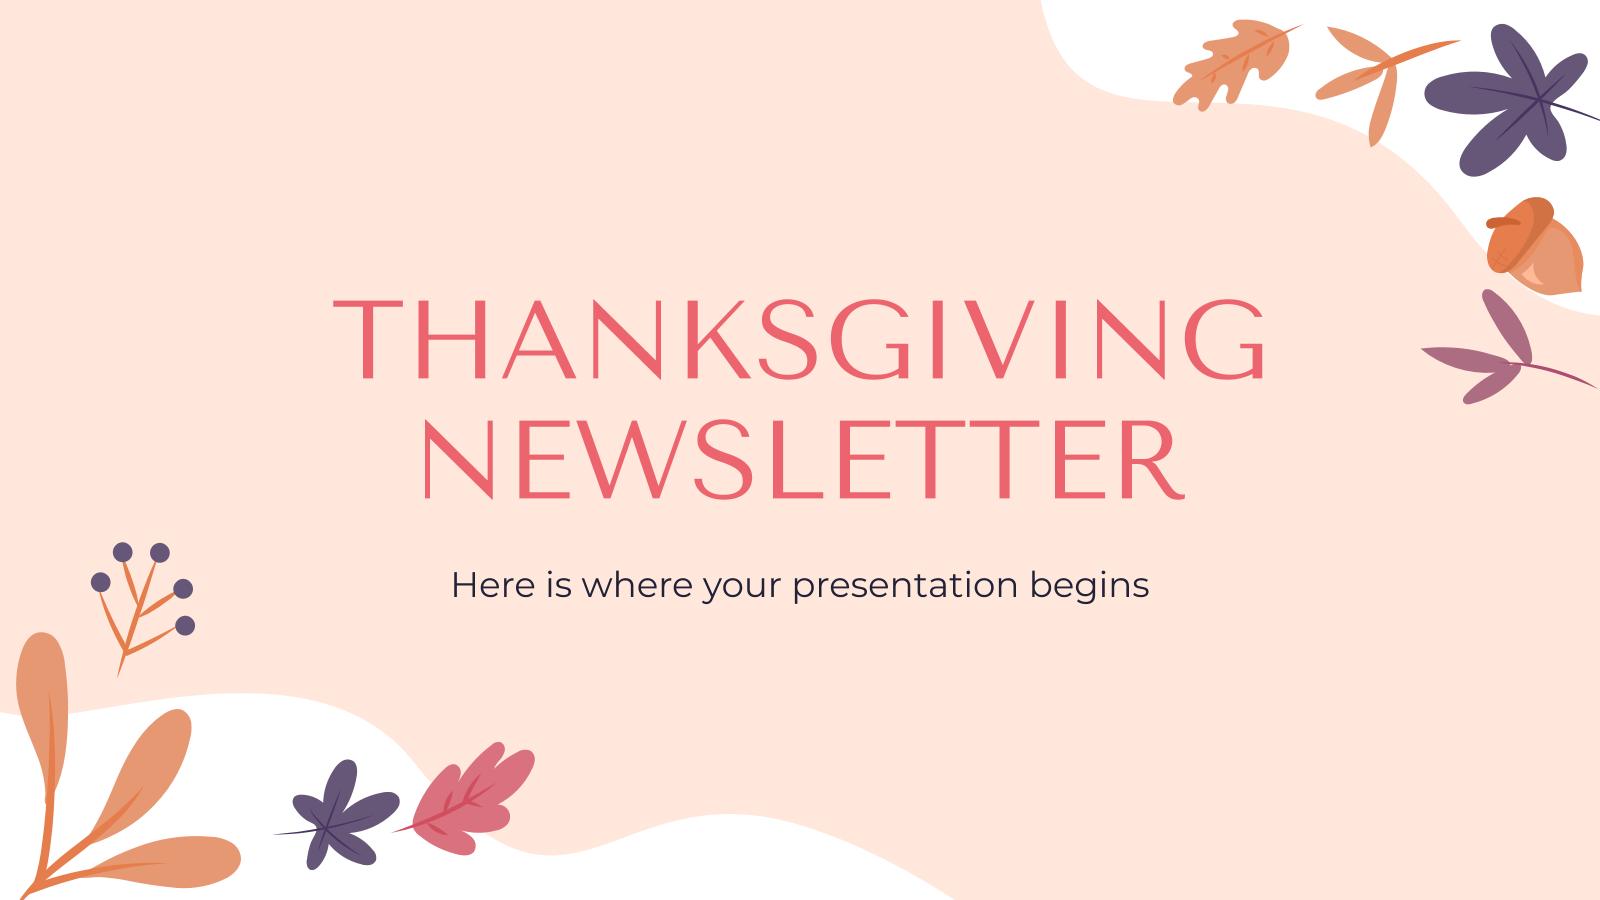 Plantilla de presentación Newsletter de Acción de Gracias